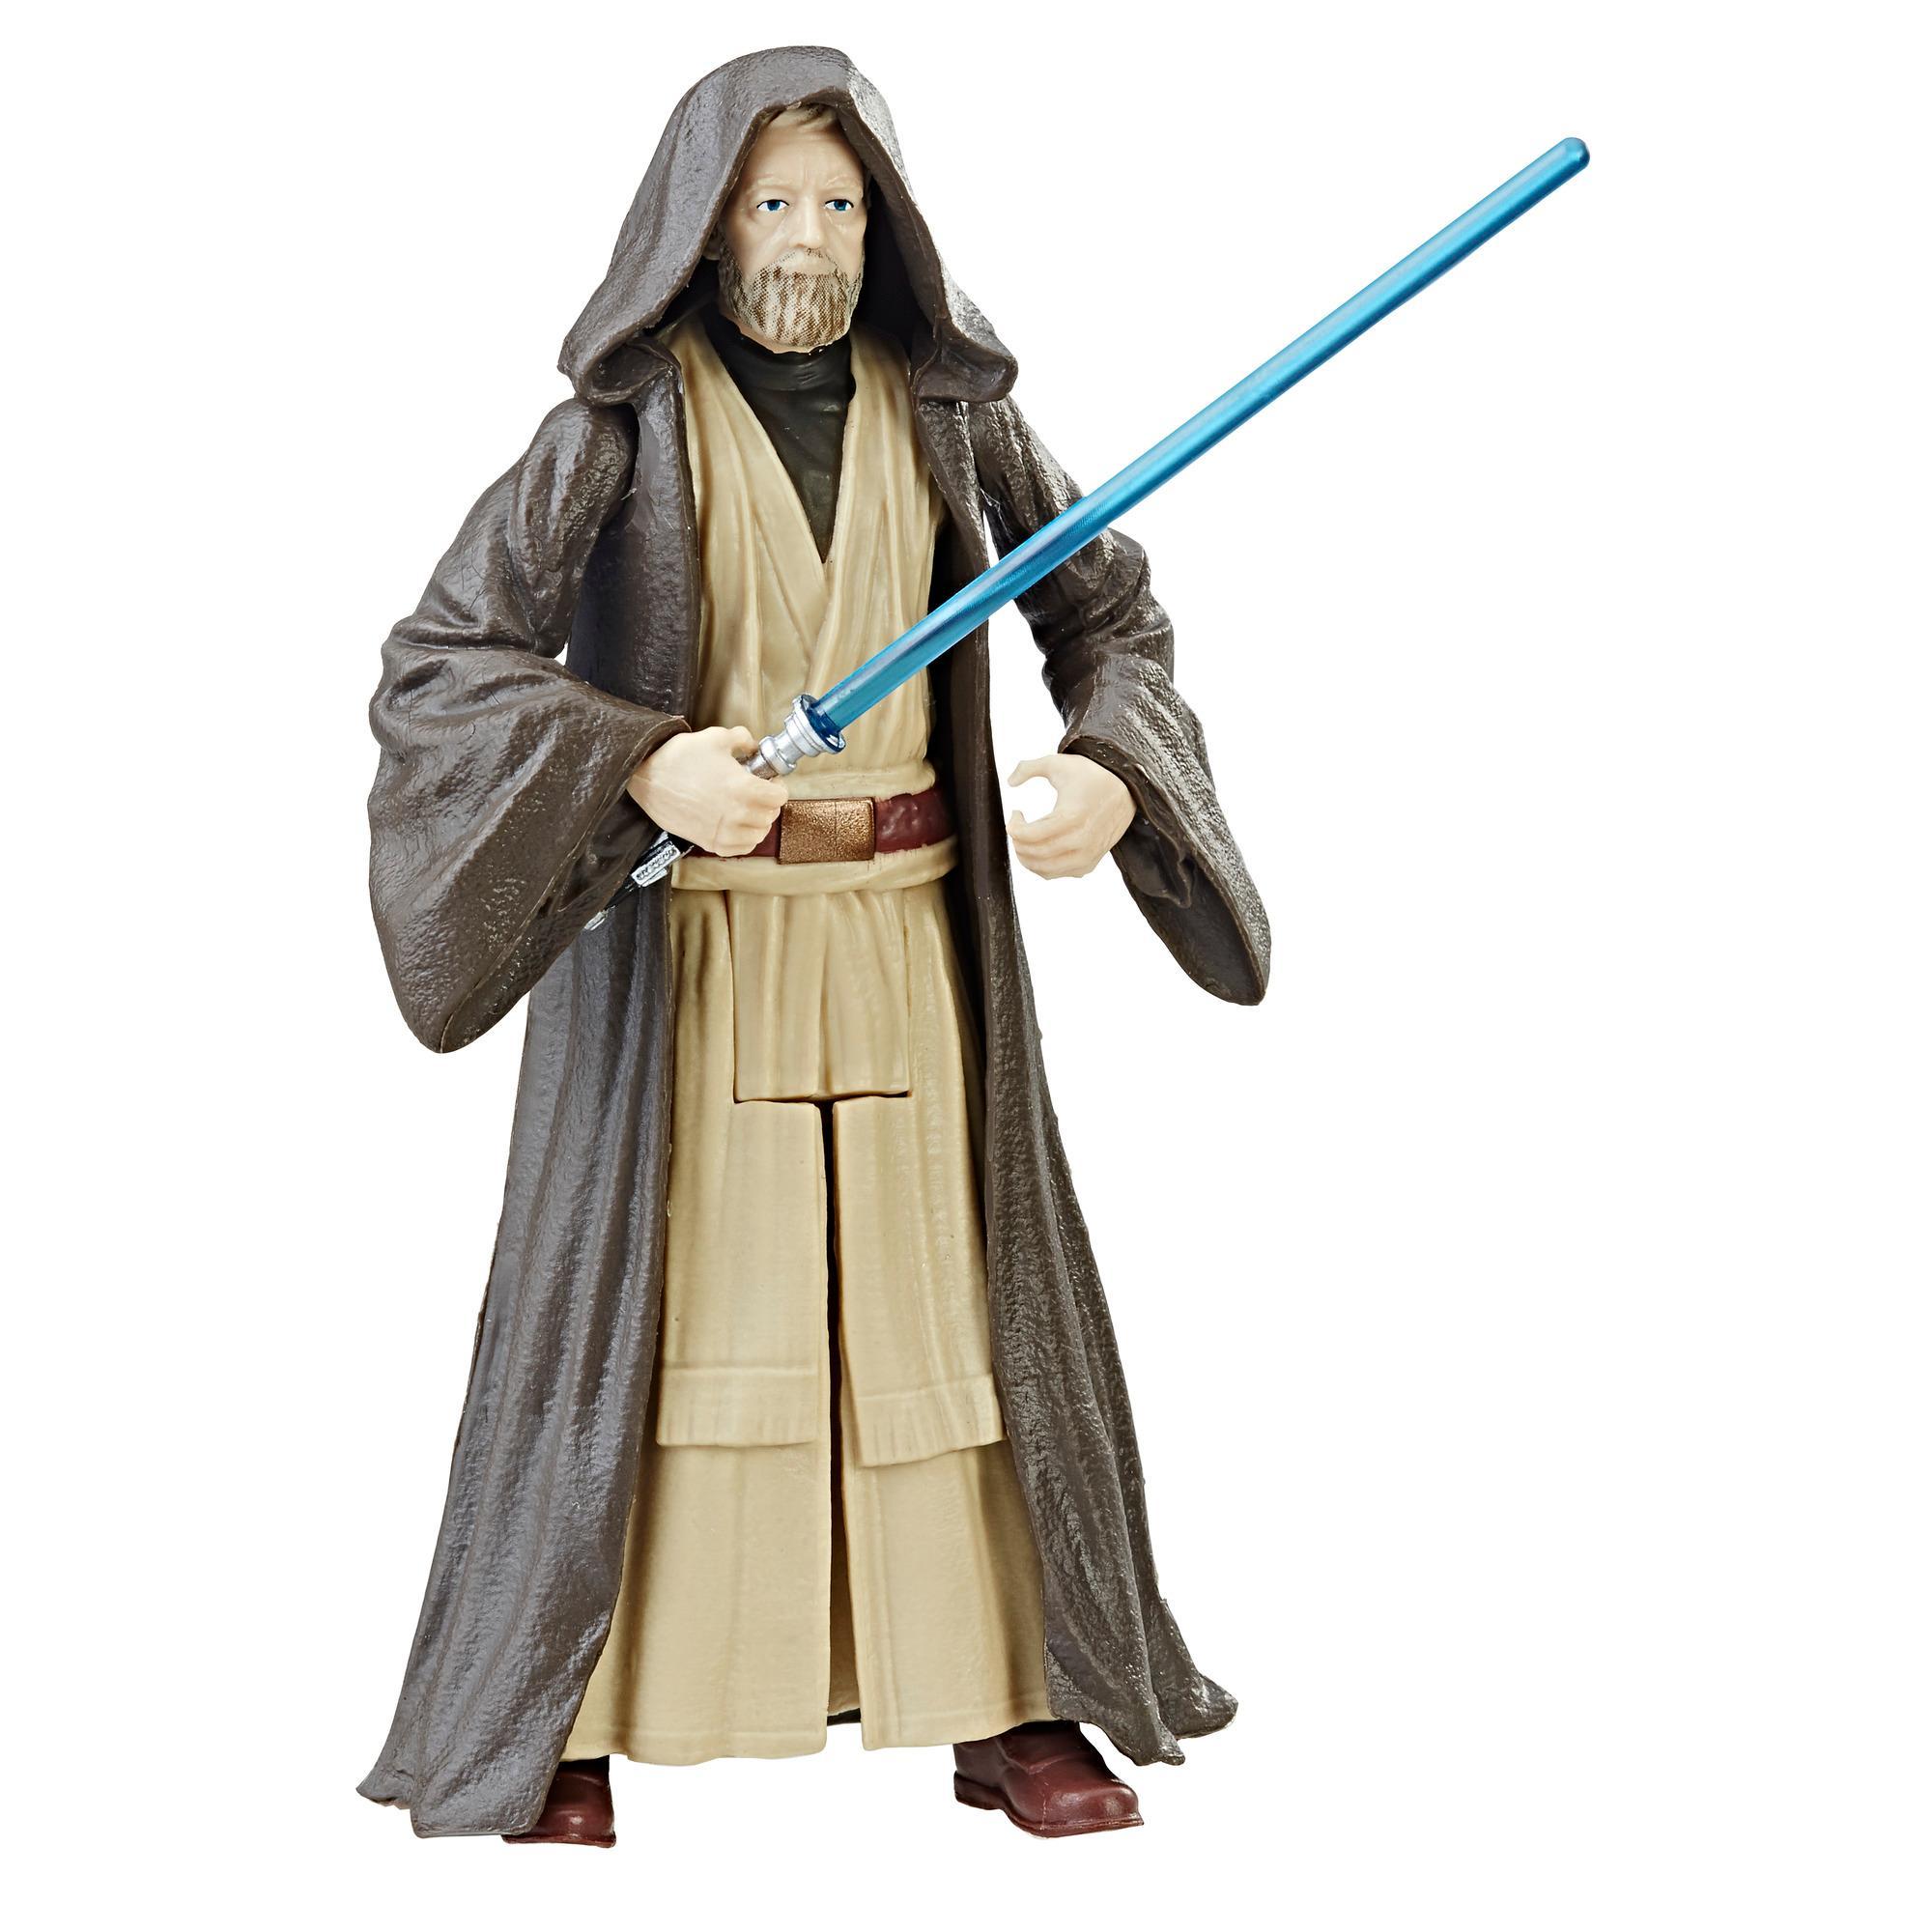 Star Wars - Figurine Obi-Wan Kenobi avec Force Link